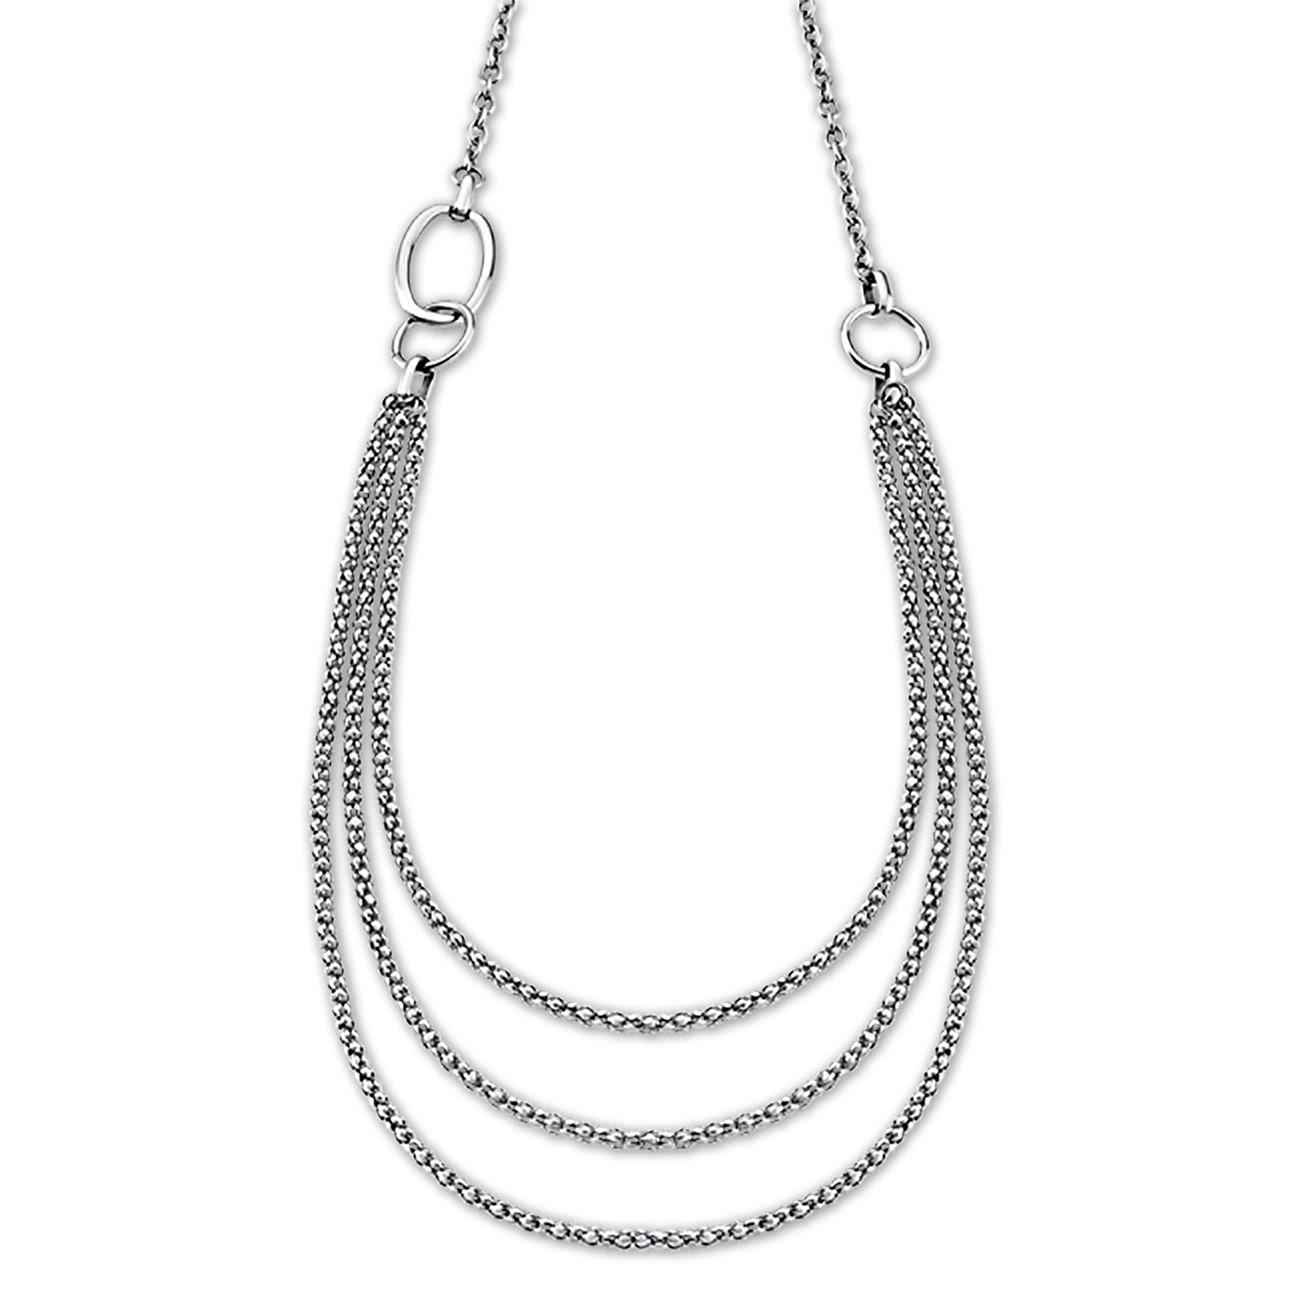 LOTUS Style Halskette Damen Edelstahl silber LS1817-1/1 Woman JLS1817-1-1